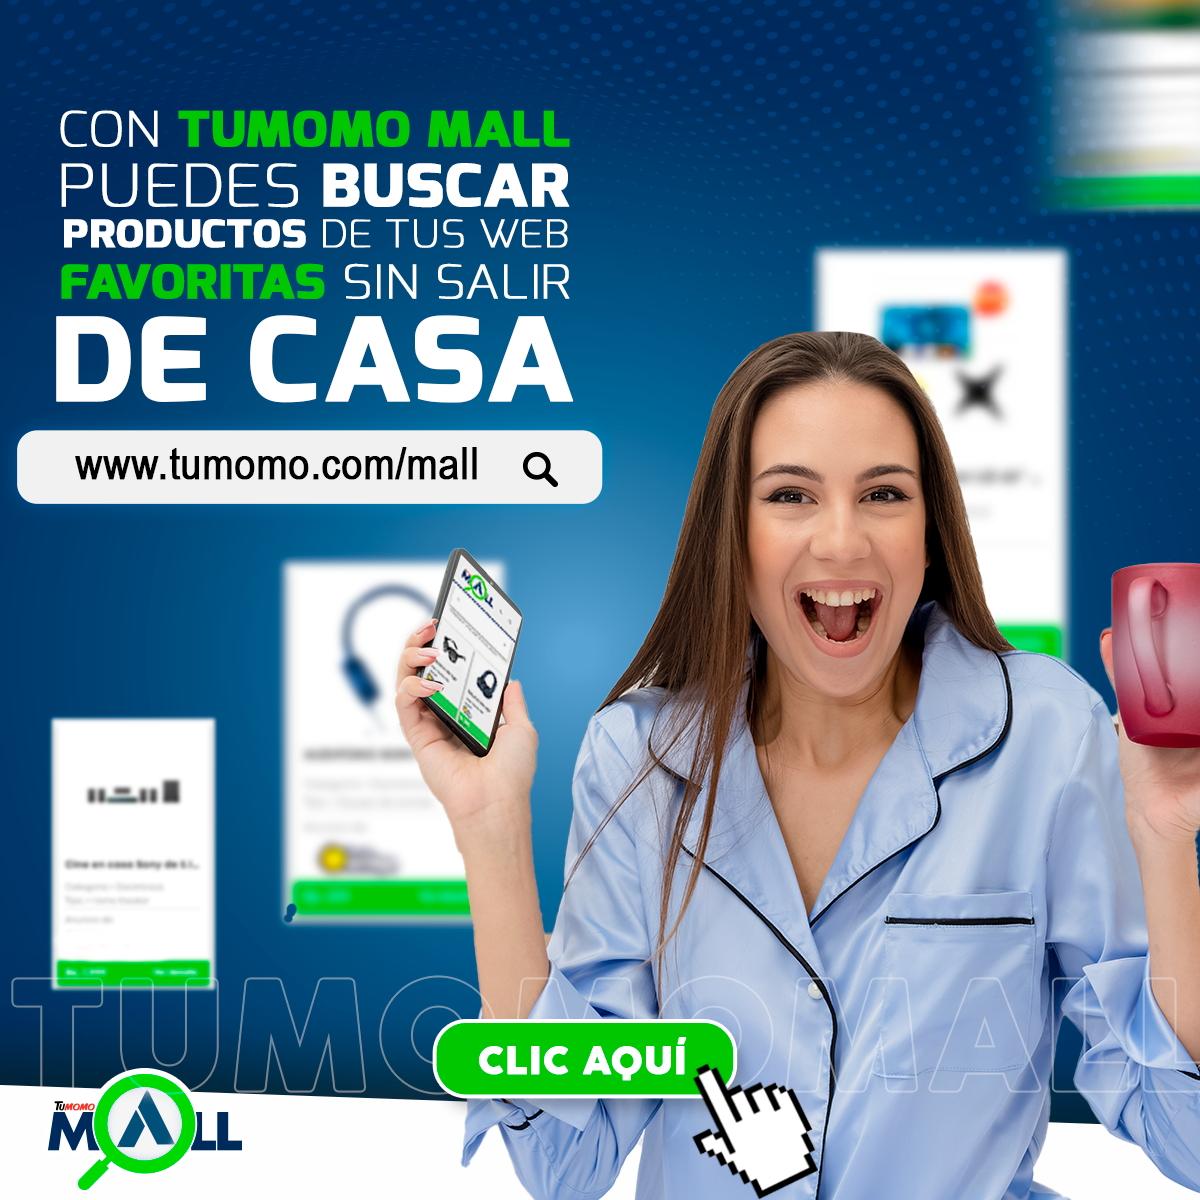 Tumomo.com/mall